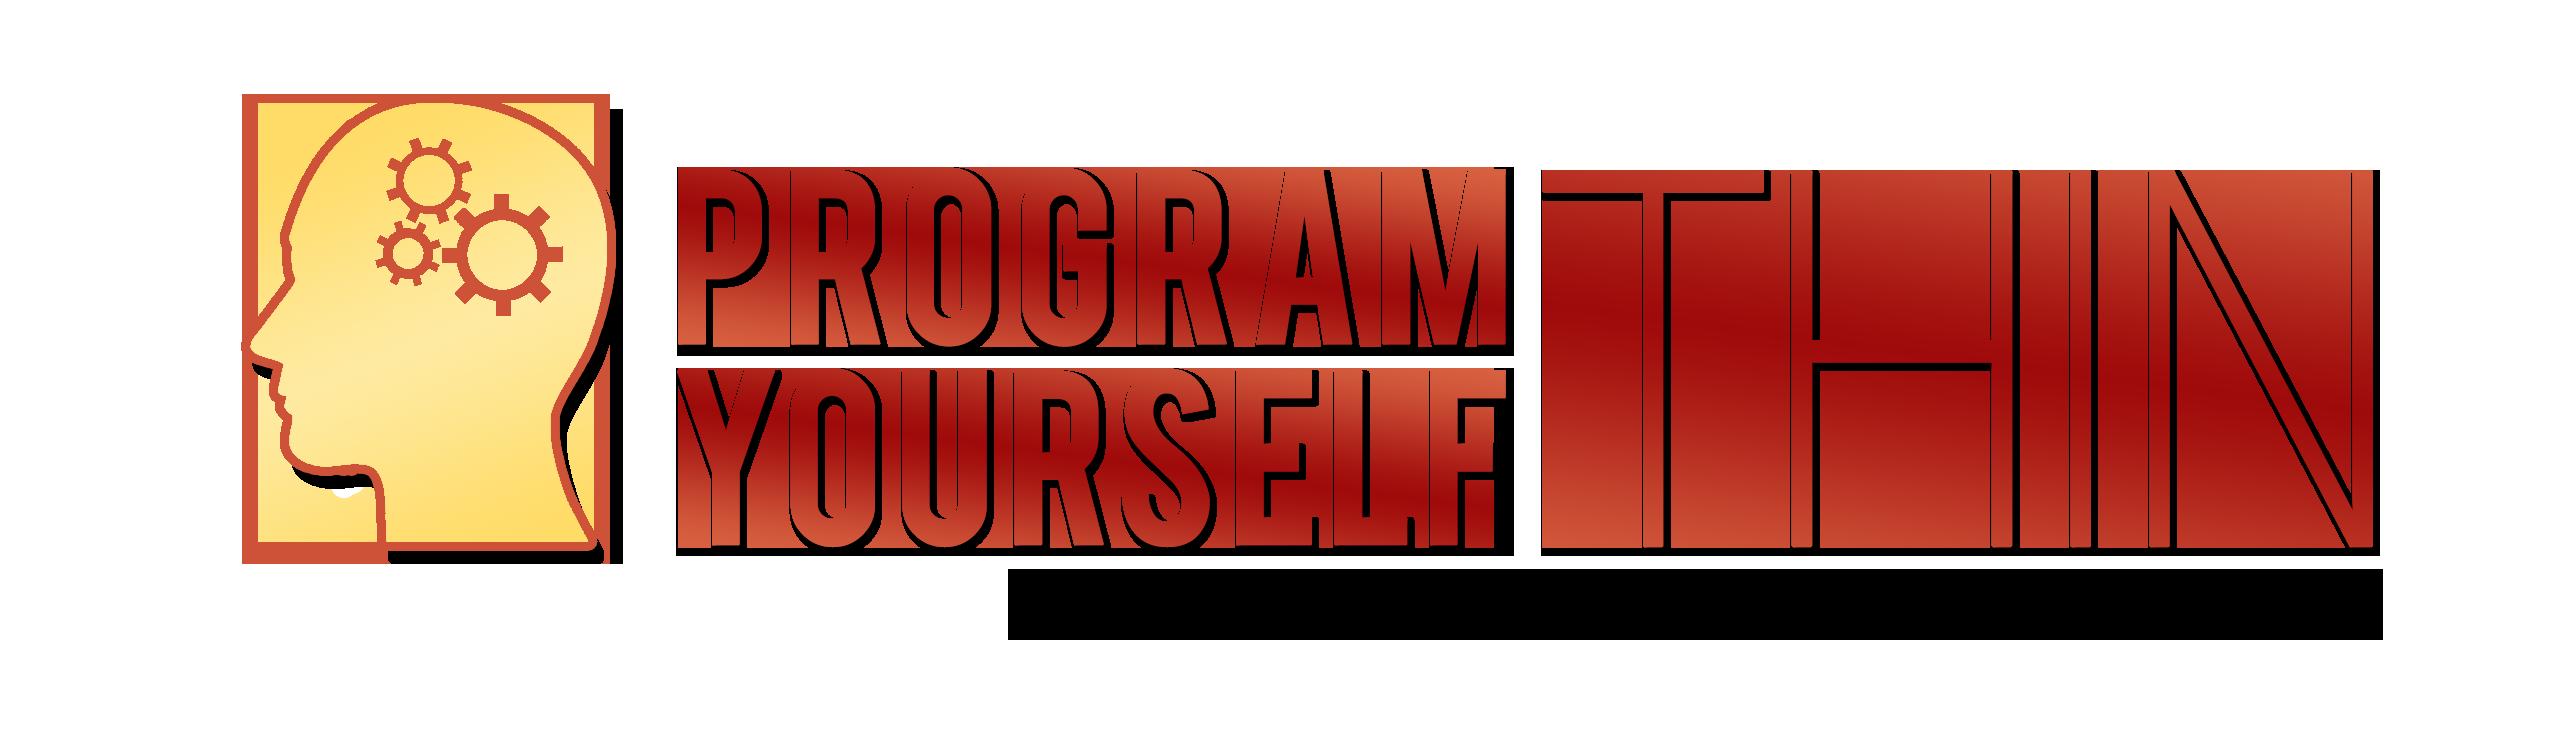 Program Yourself Thin